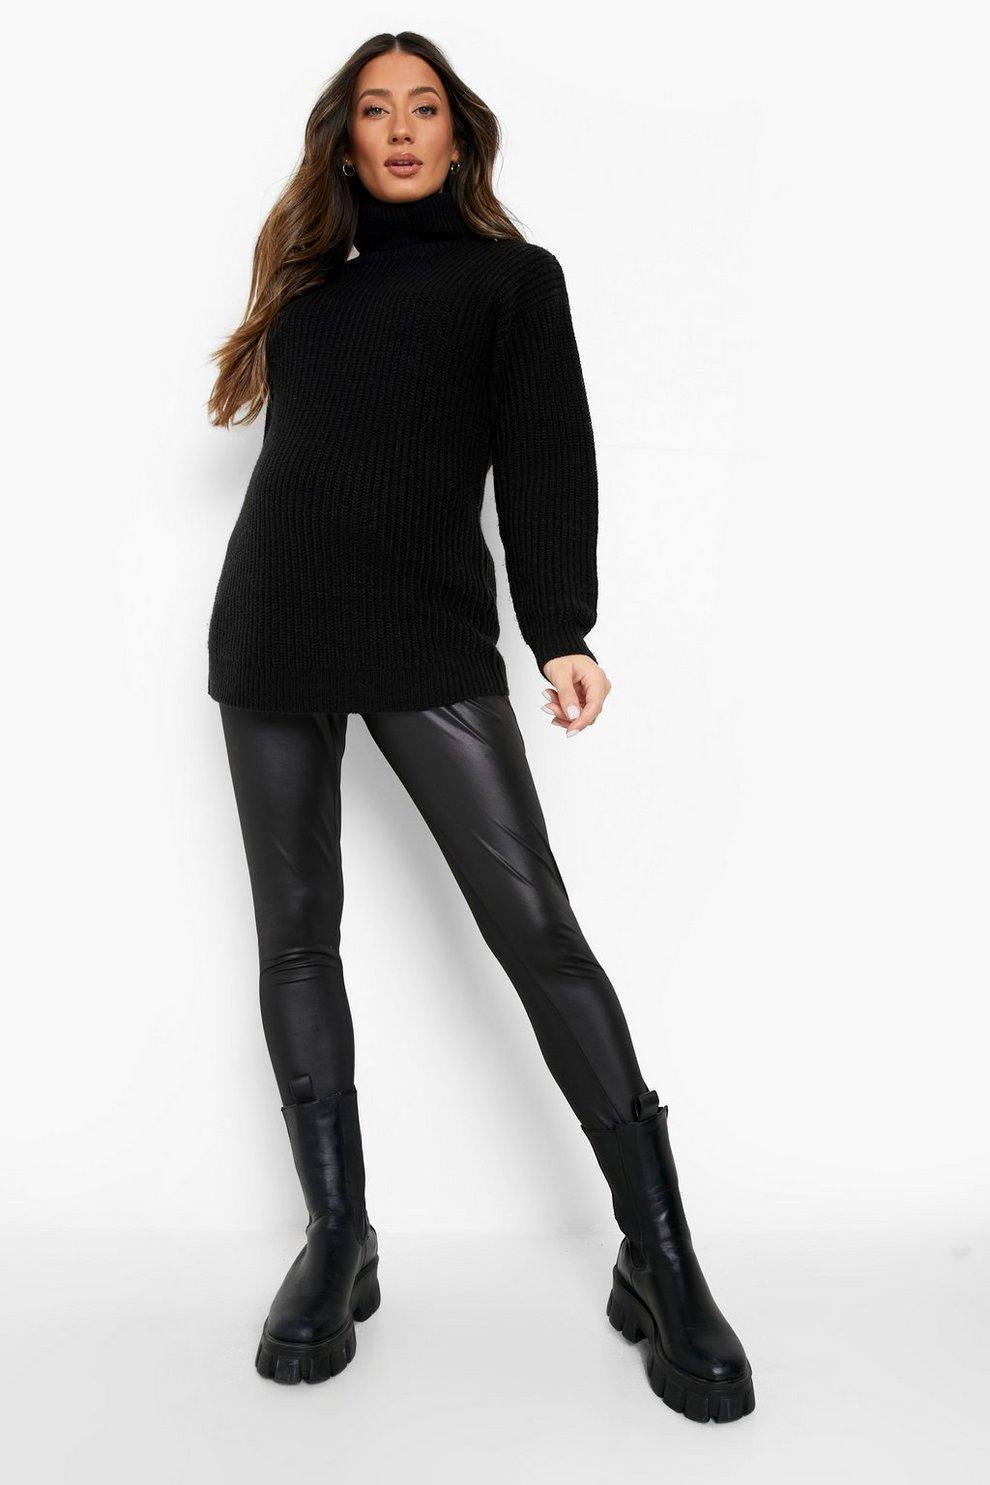 33cd78c81e4e Womens Black Maternity Leather Look Over The Bump Legging